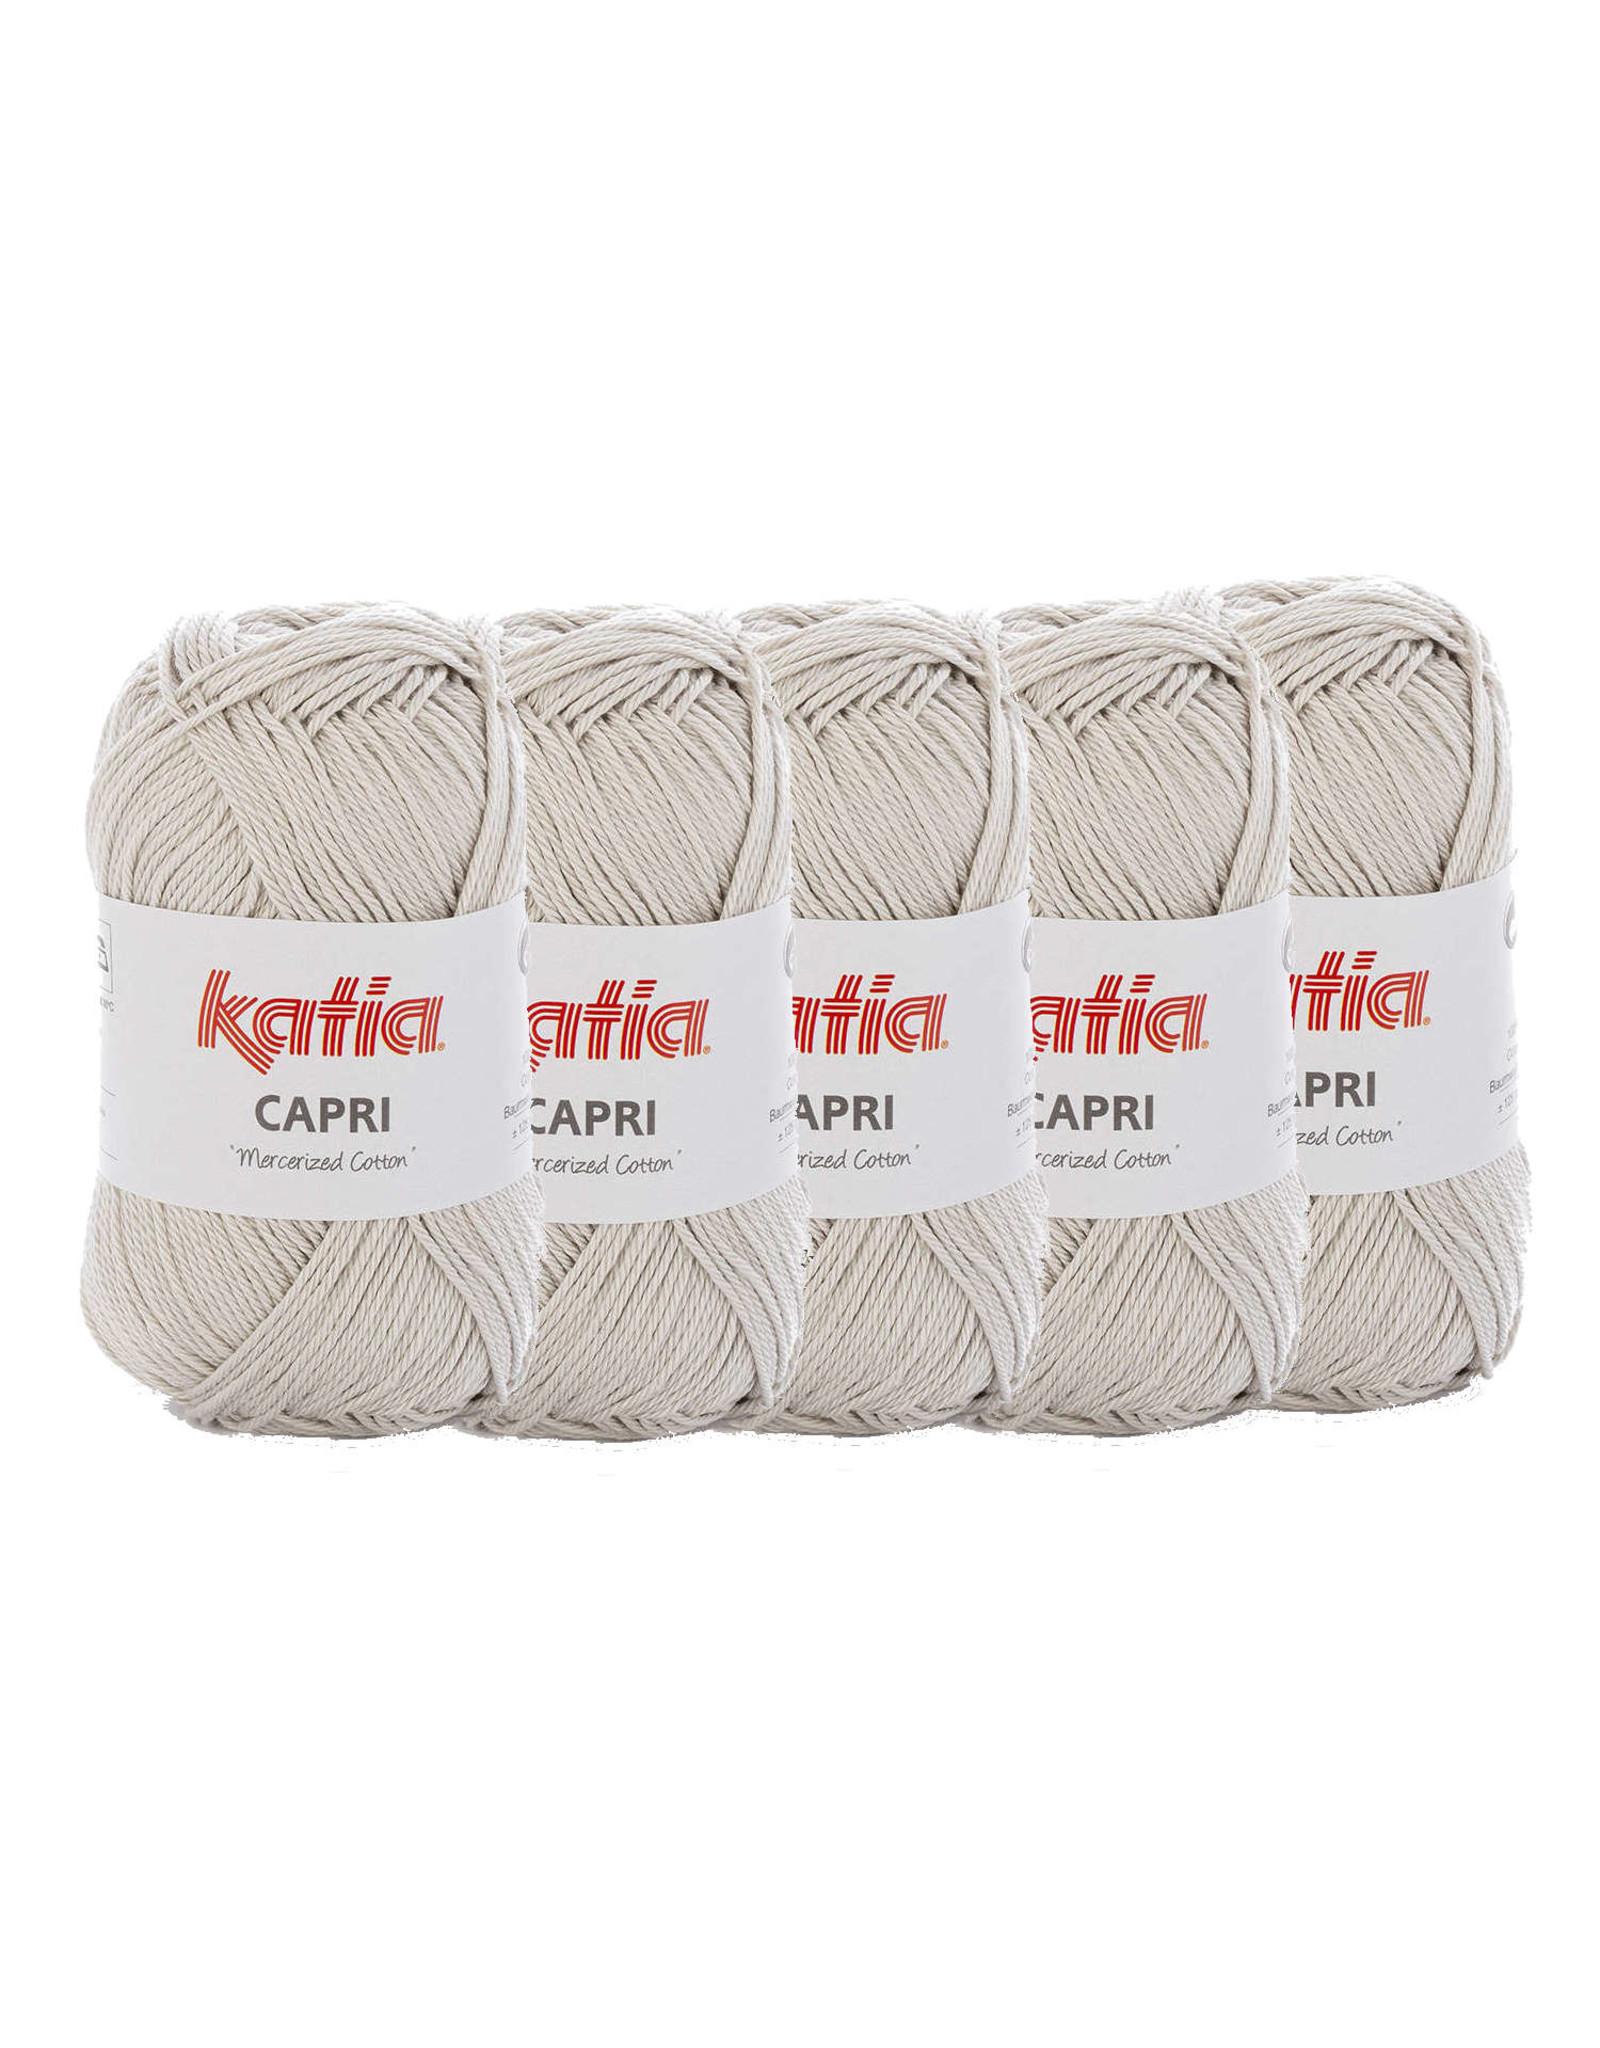 Katia Katia Capri - kleur 134 Parel lichtgrijs- bundel 5 x 50 gr. / 125 m. - 100% katoen